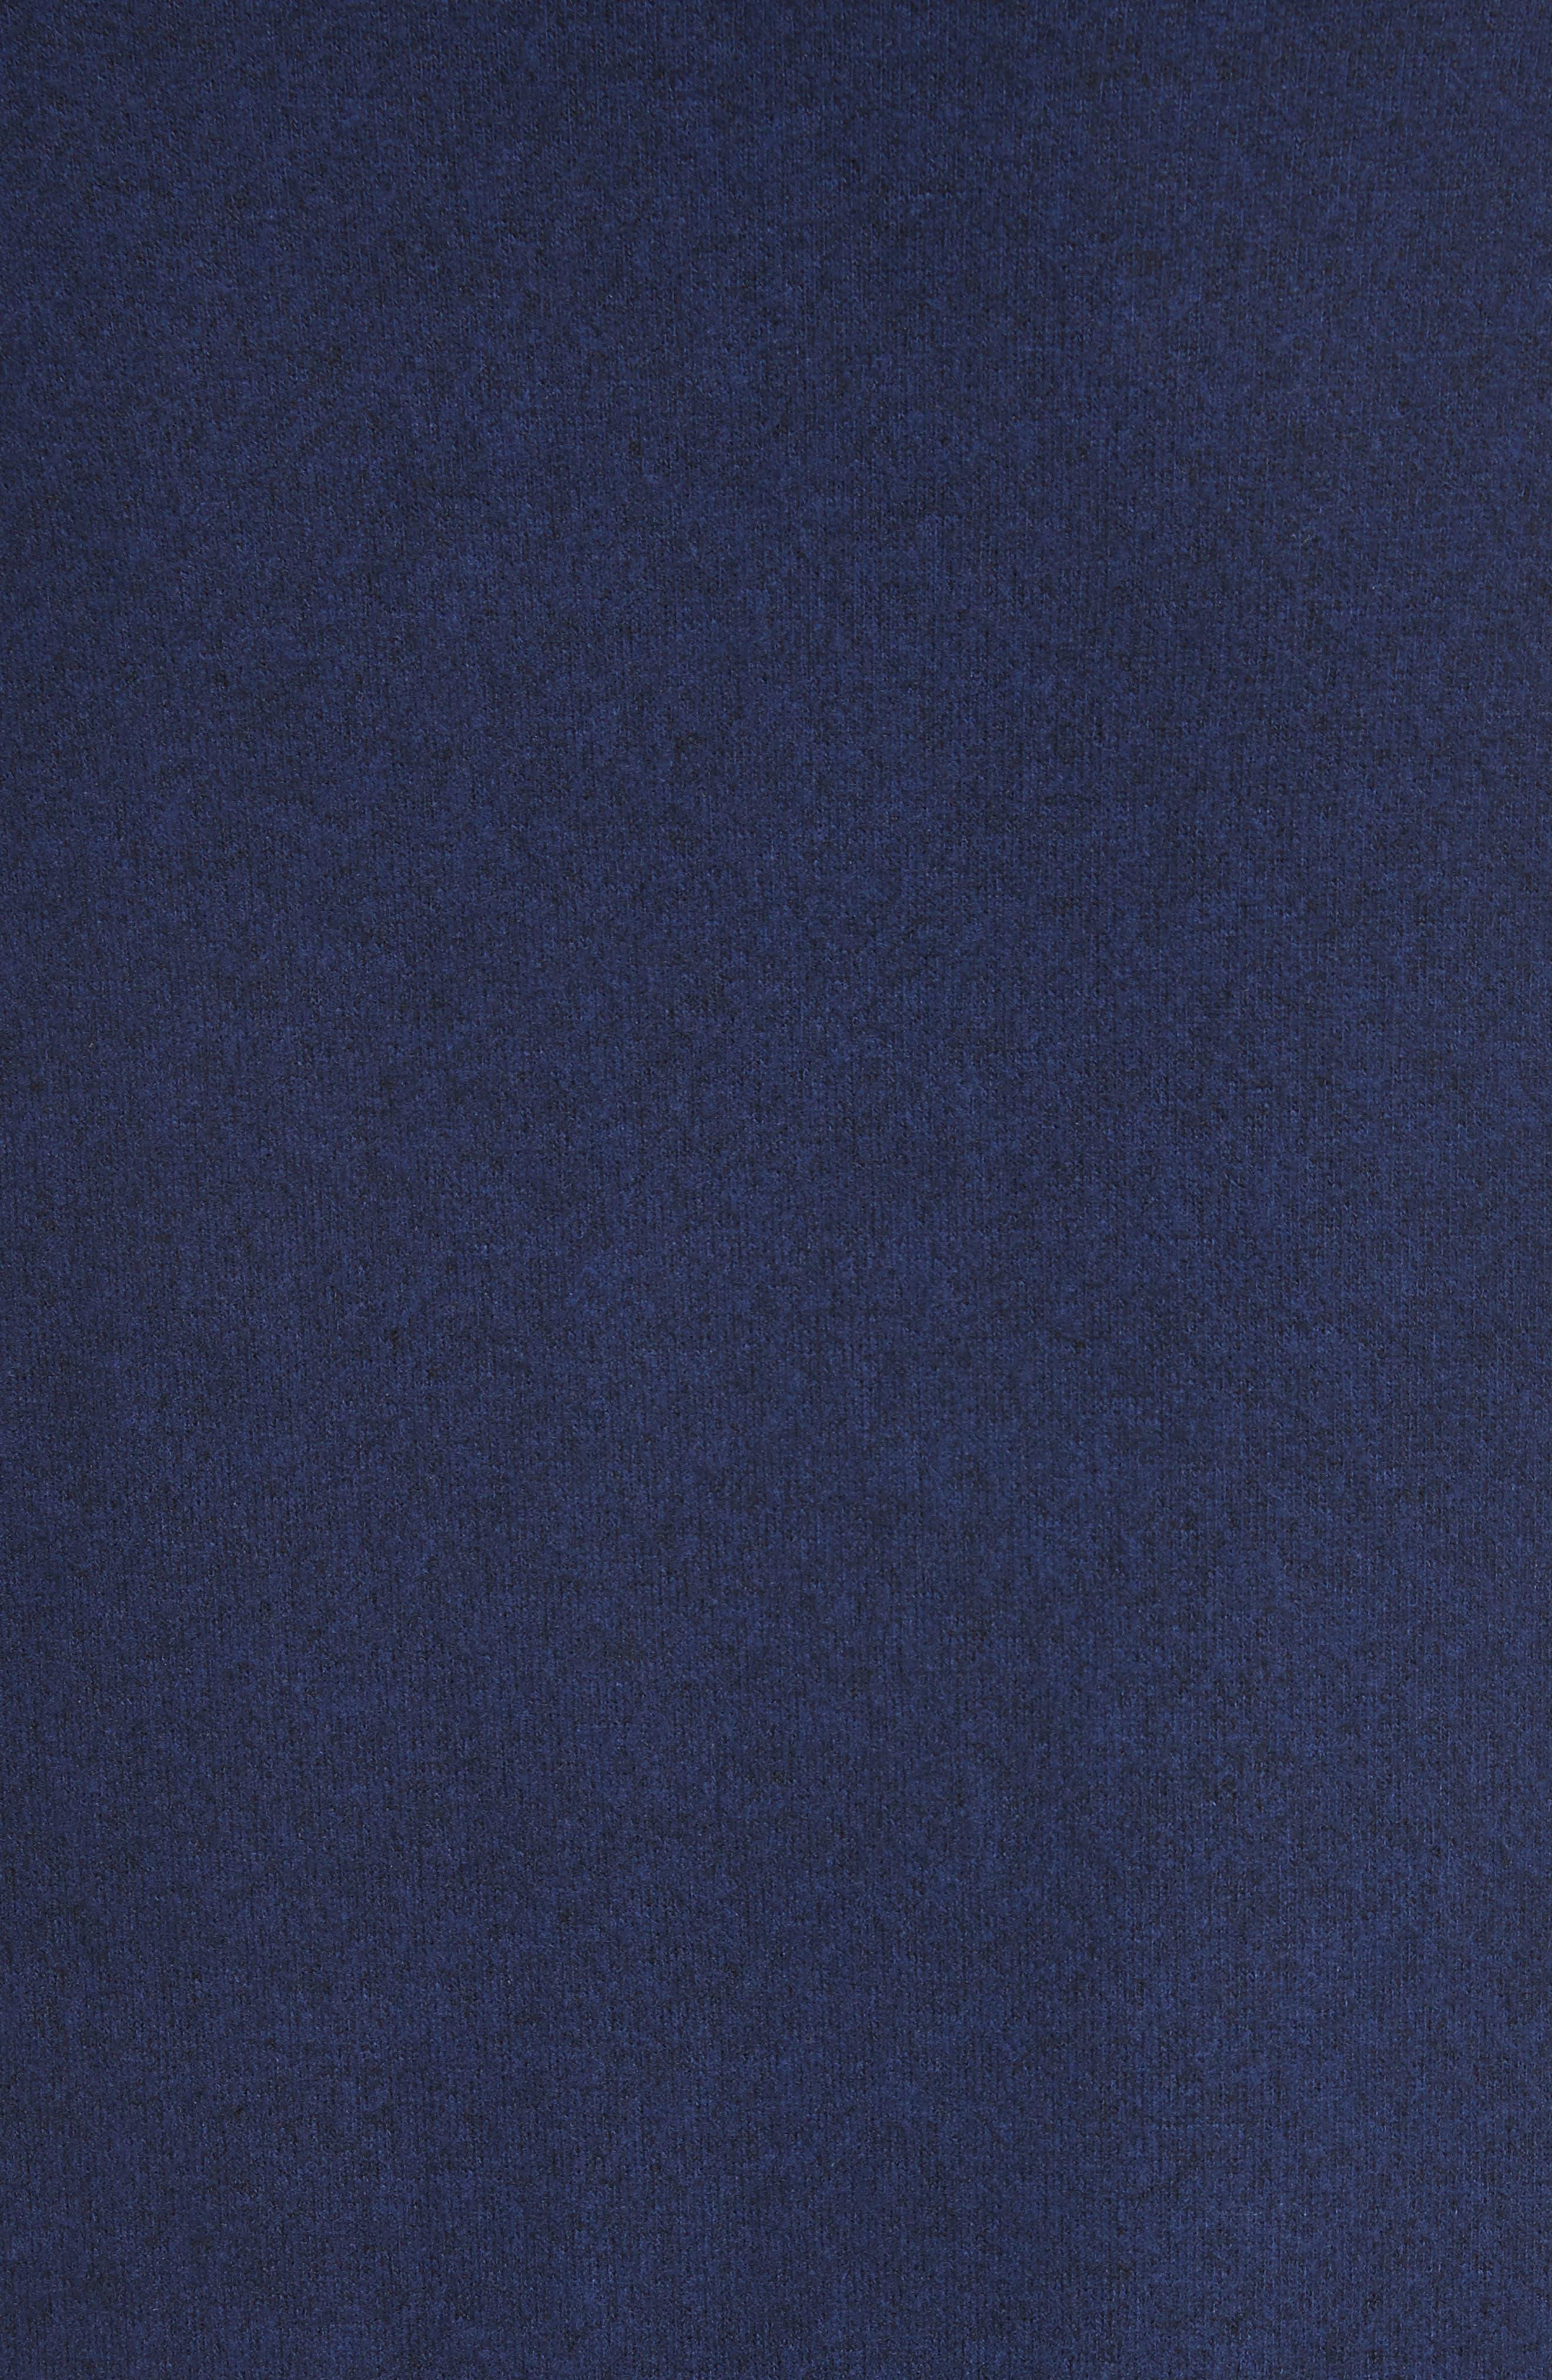 Soft Joie Tammy Asymmetrical Sweater,                             Alternate thumbnail 5, color,                             404